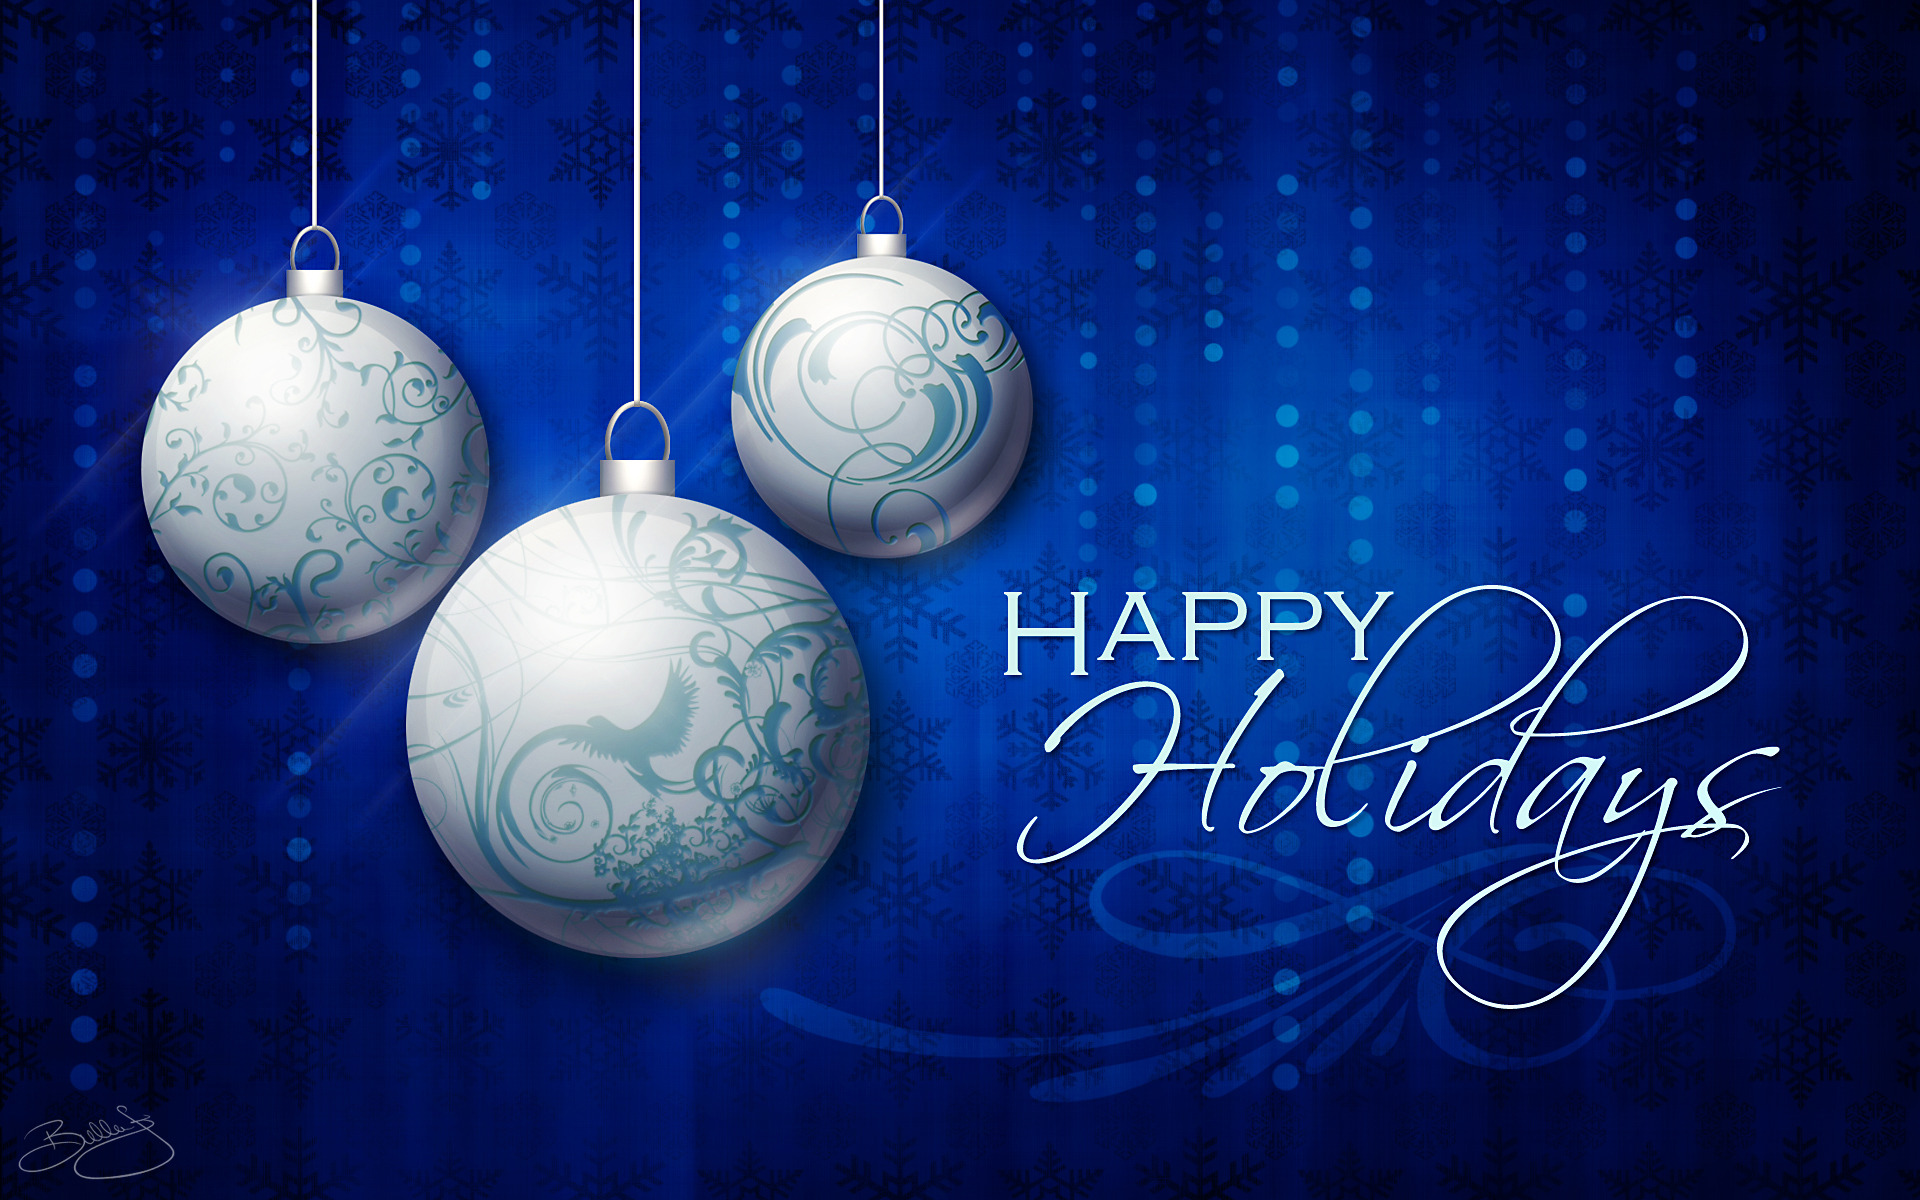 Holydays clipart blue Wallpaper Holidays  Art Holidays